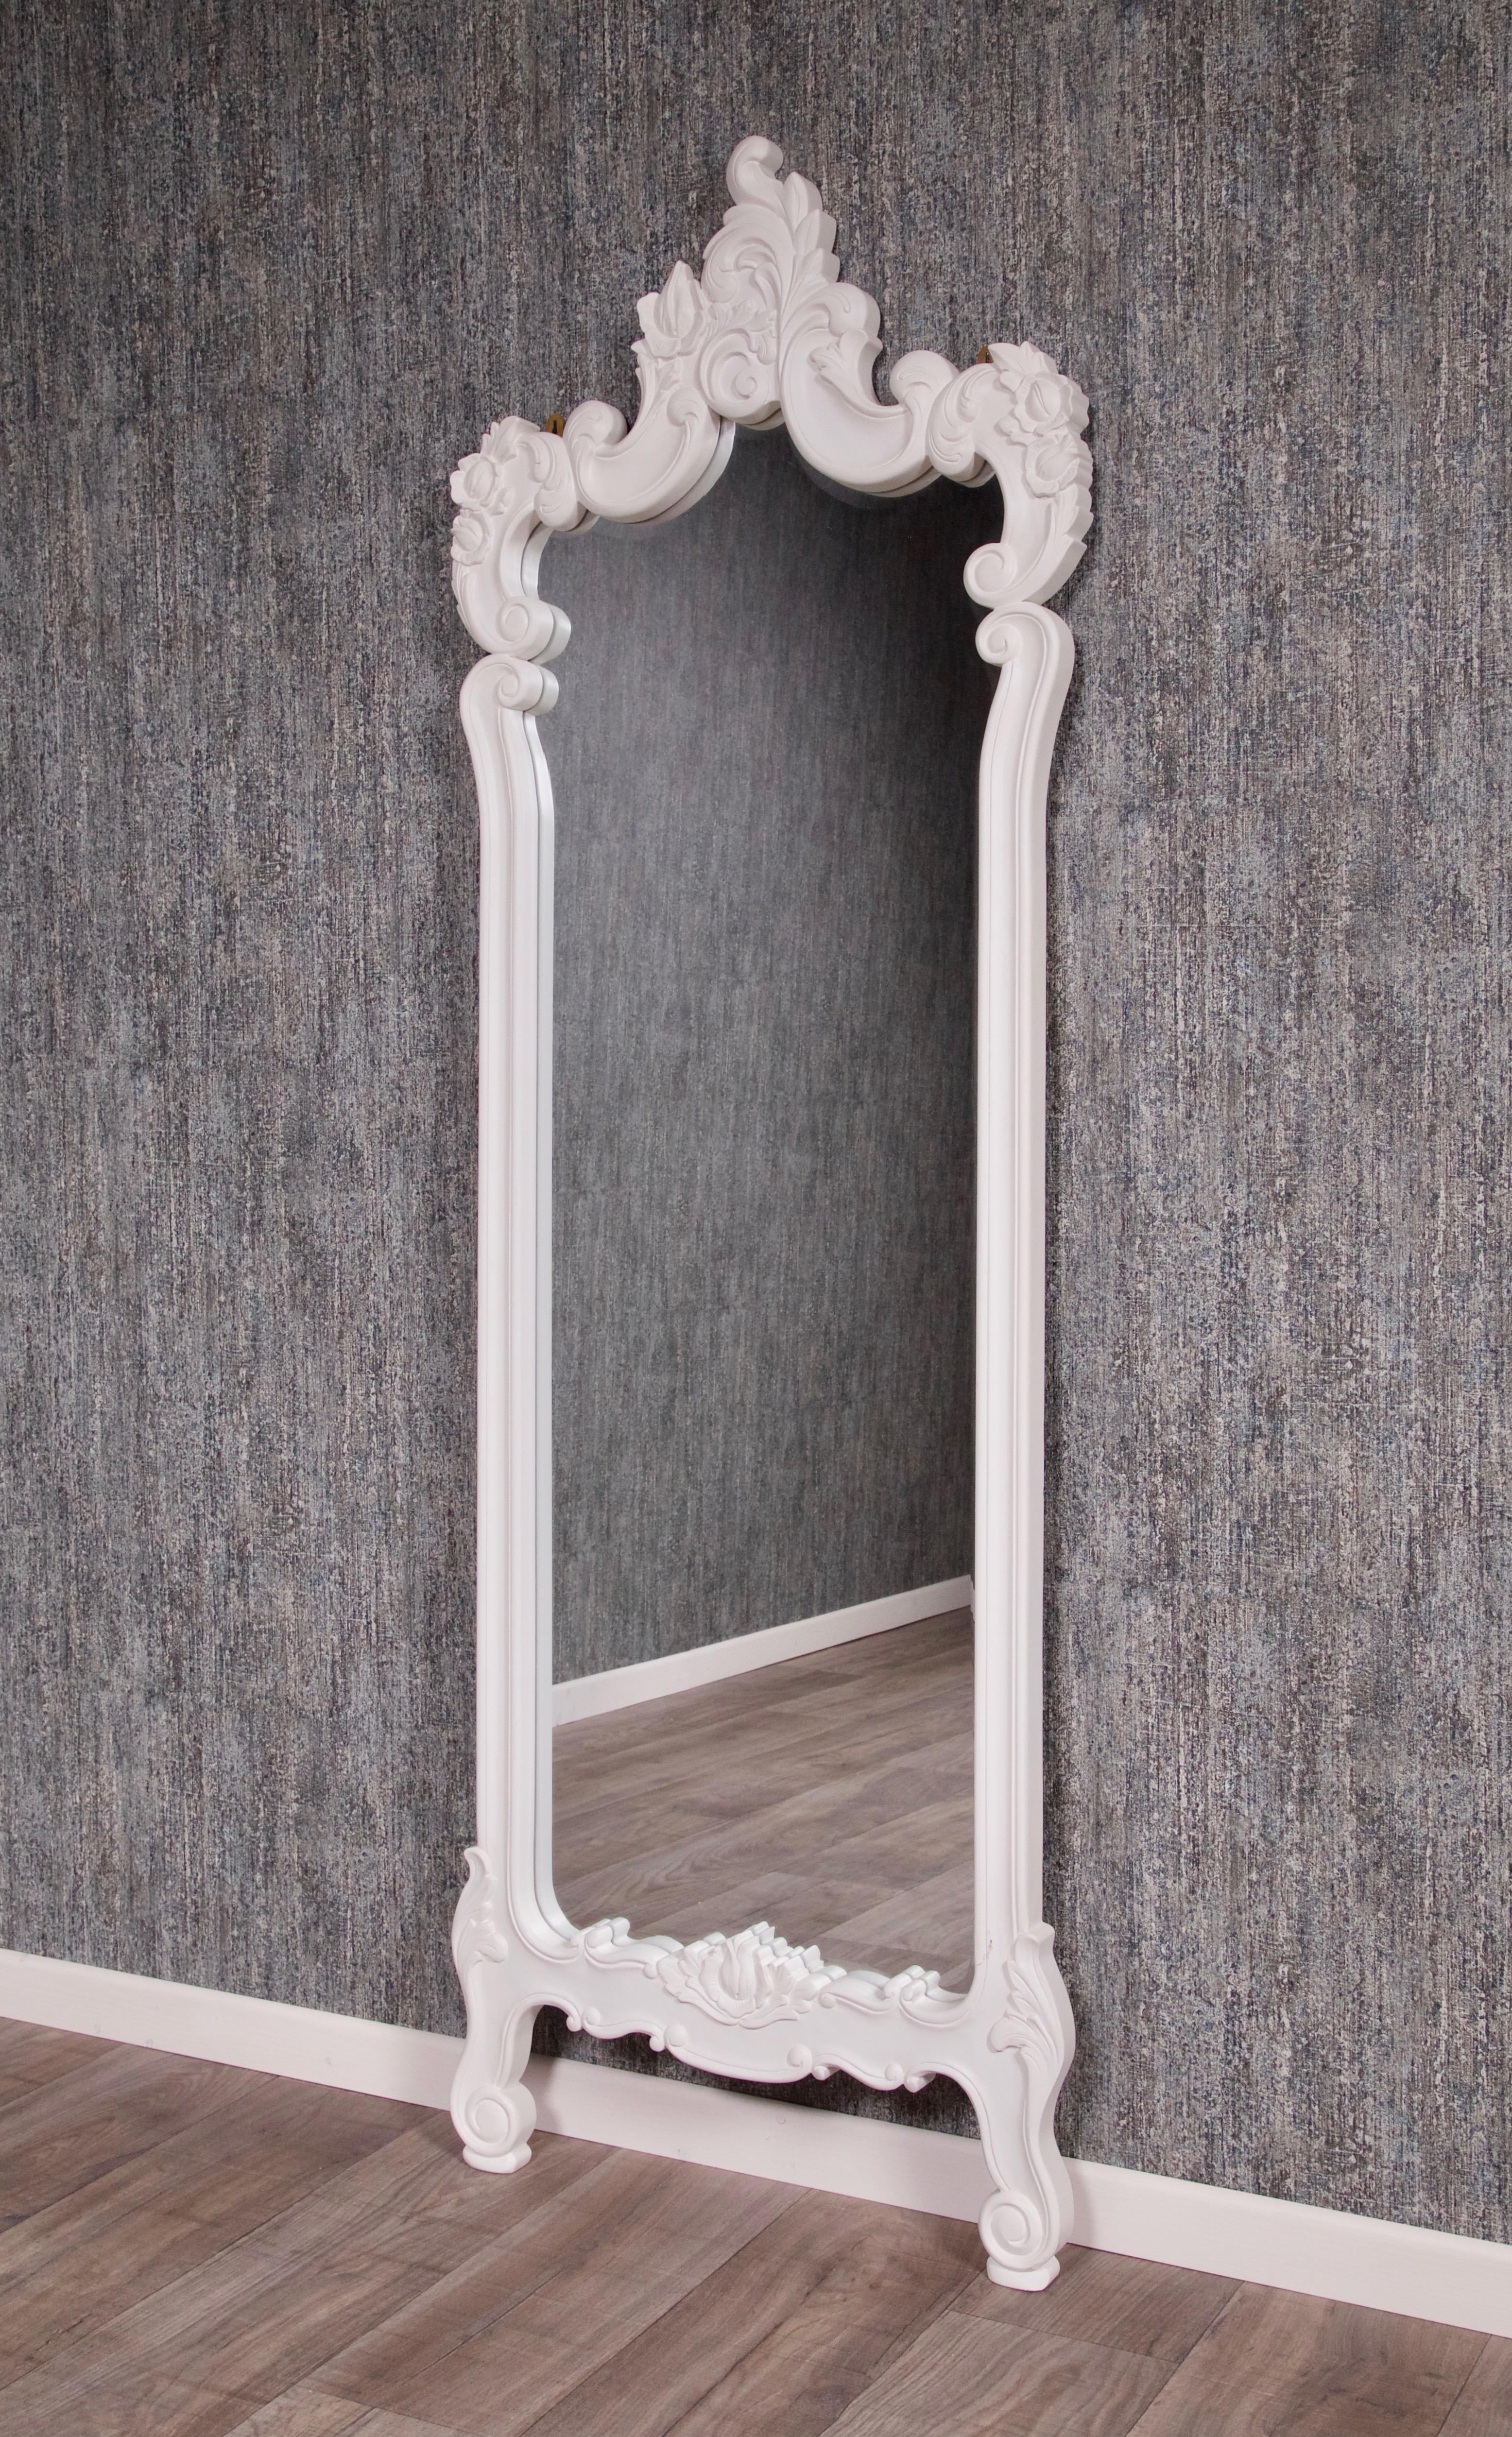 barock wandspiegel antik wei schminktische spiegel shop repro antik design. Black Bedroom Furniture Sets. Home Design Ideas